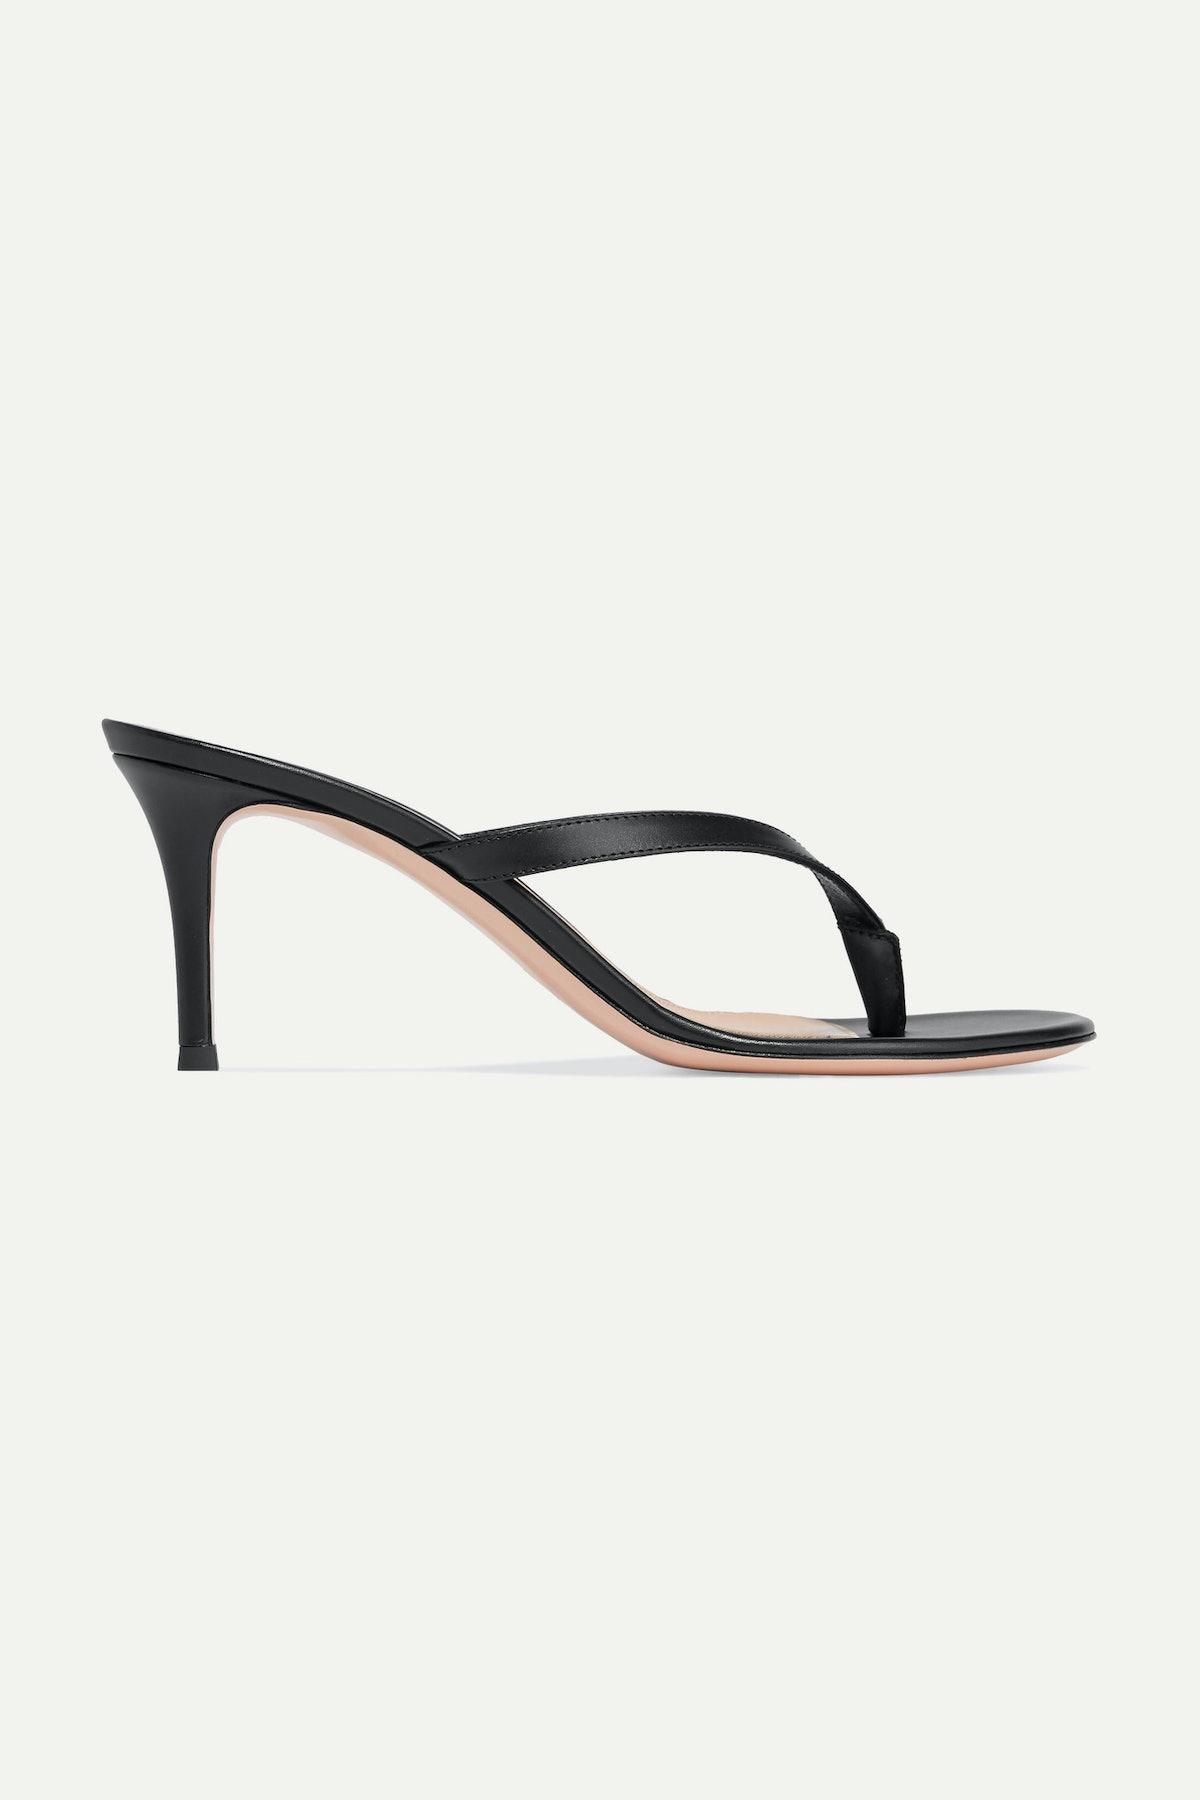 Calypso 70 Leather Sandals